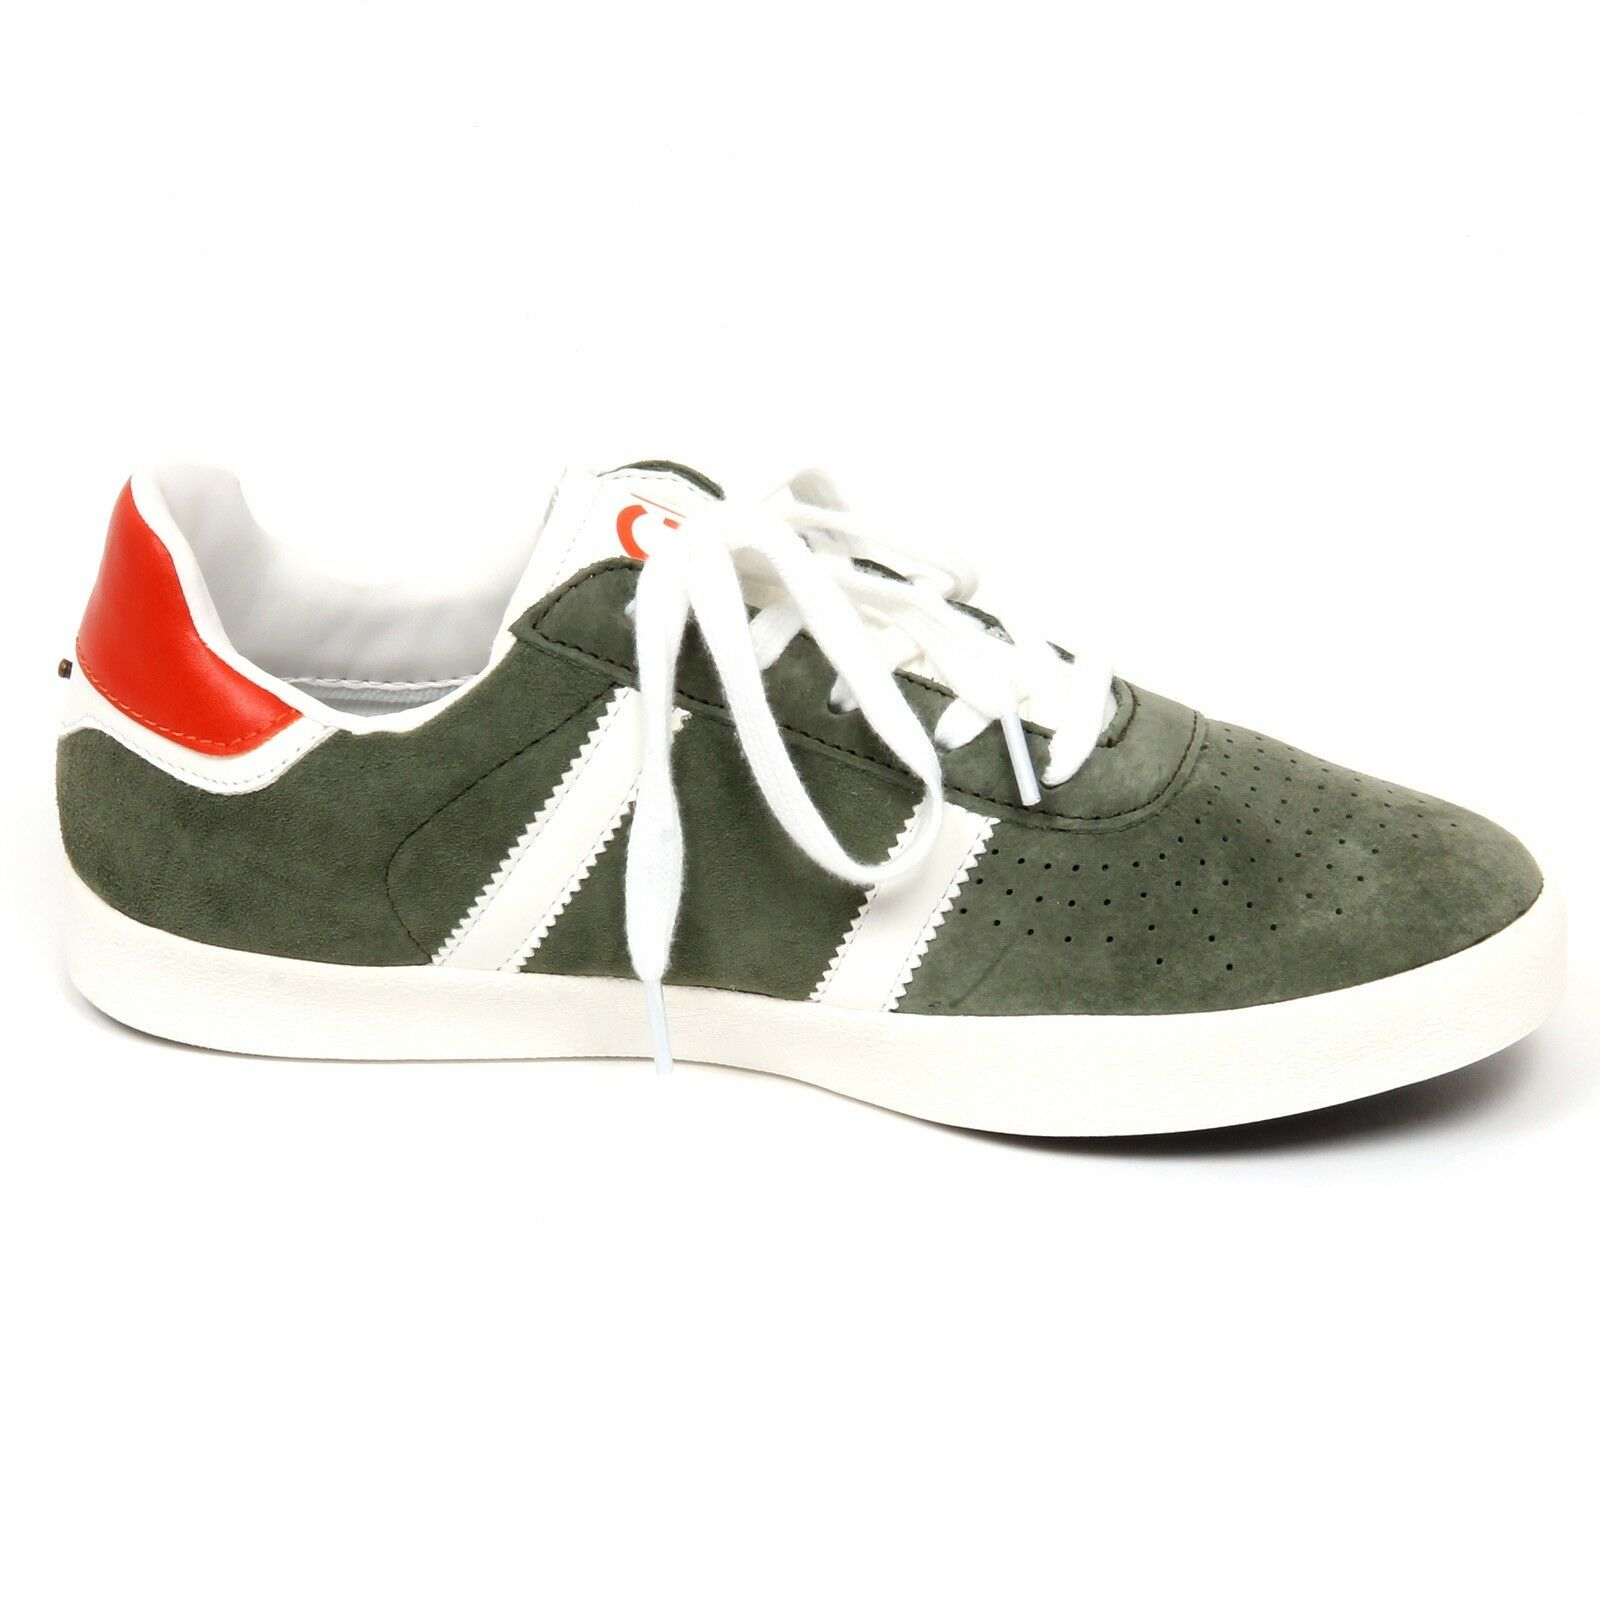 E9558 sneaker uomo green olive GAUDI' scarpe shoe man